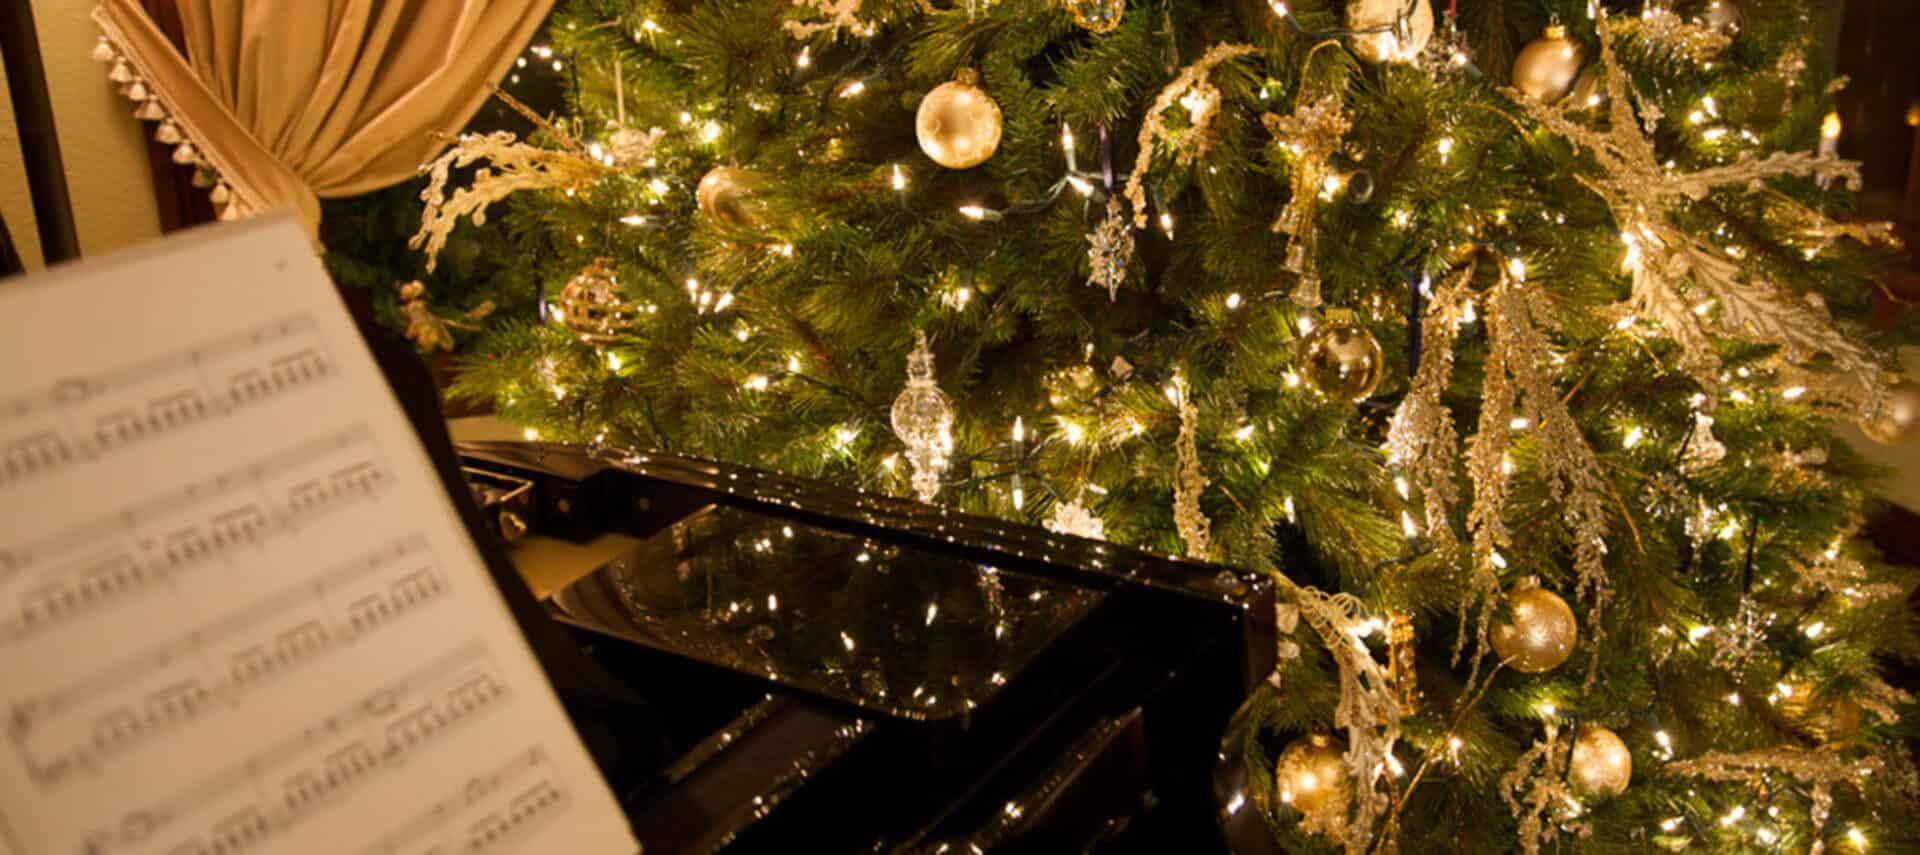 Christmas tree shines in glossy baby grand piano